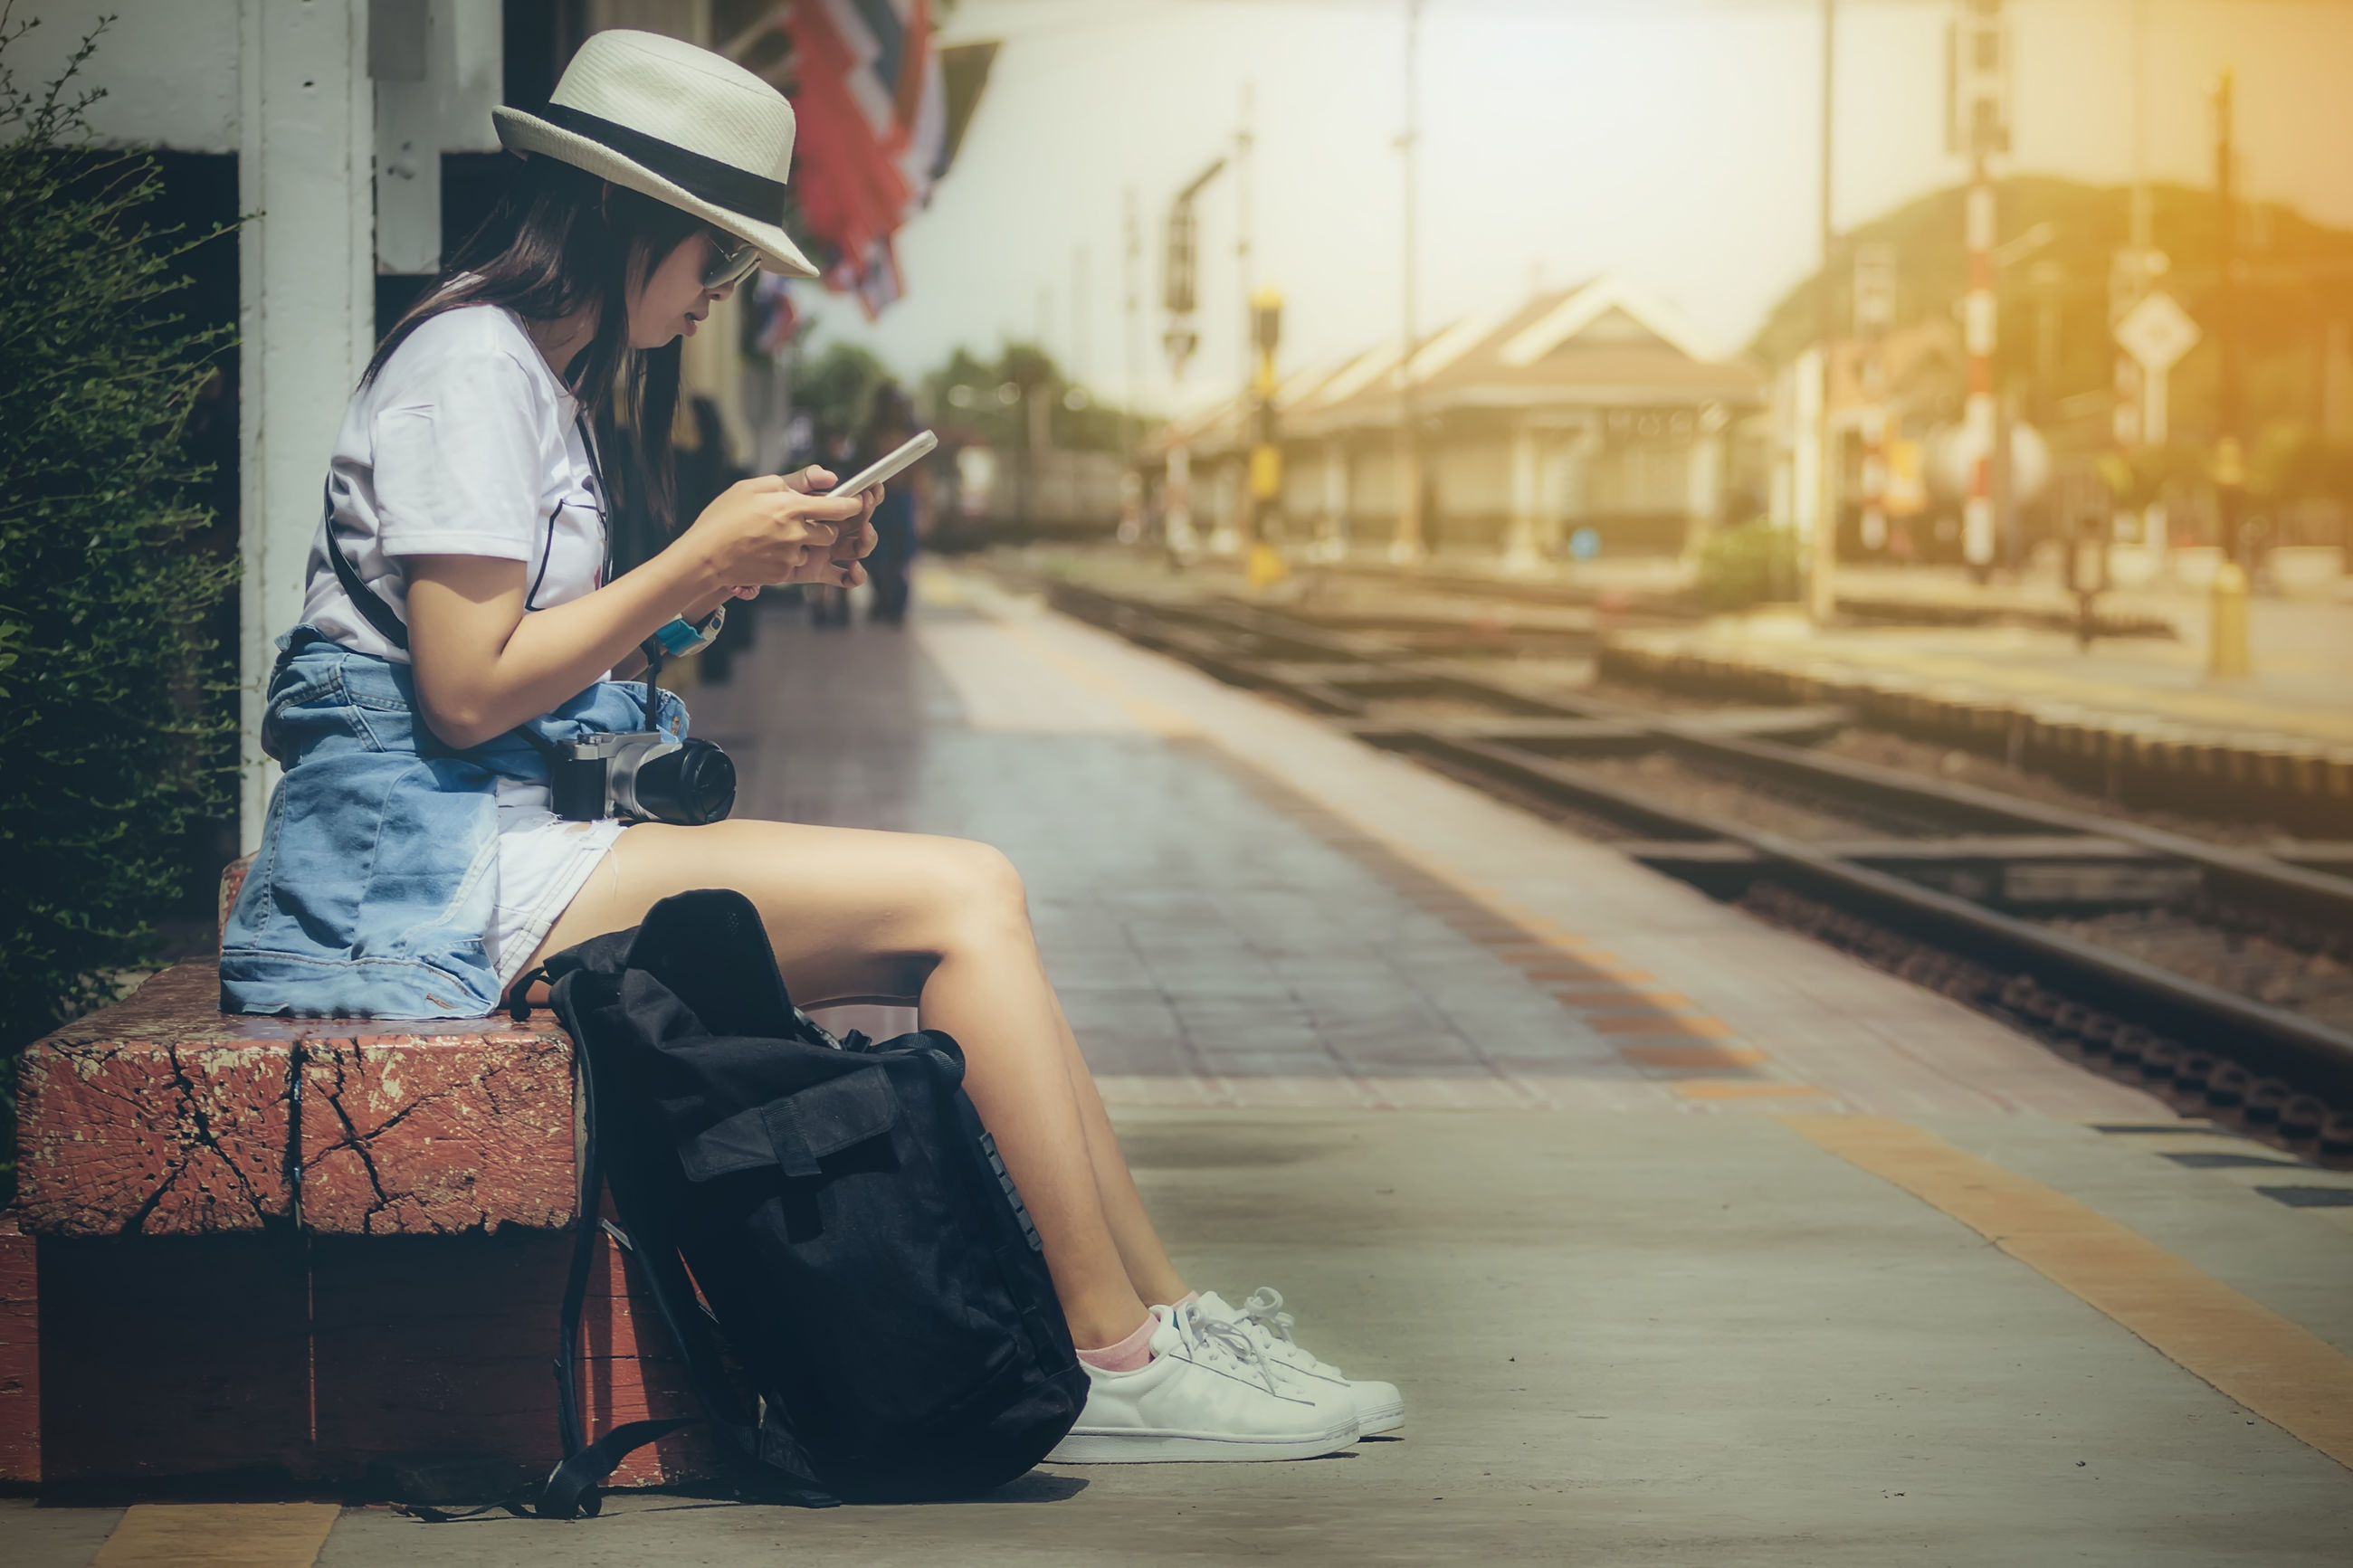 FULL LENGTH OF MAN SITTING ON RAILROAD PLATFORM